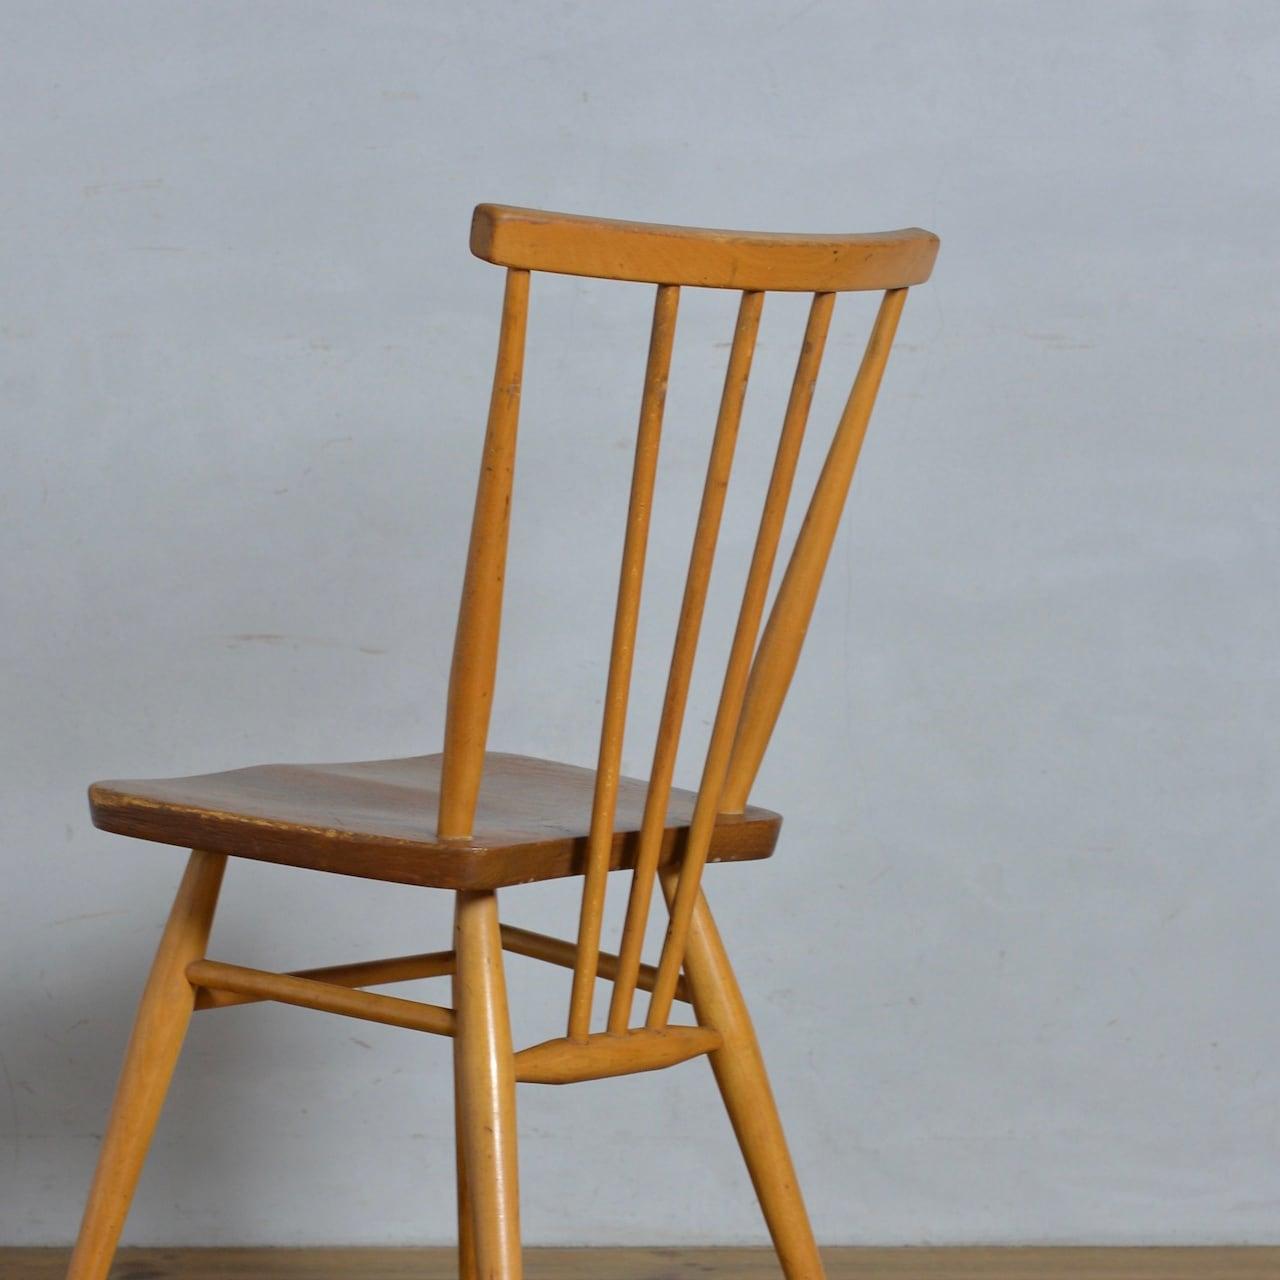 Ercol Stickback Chair / アーコール スティックバック チェア 【A】〈ダイニングチェア〉SB2007-0004